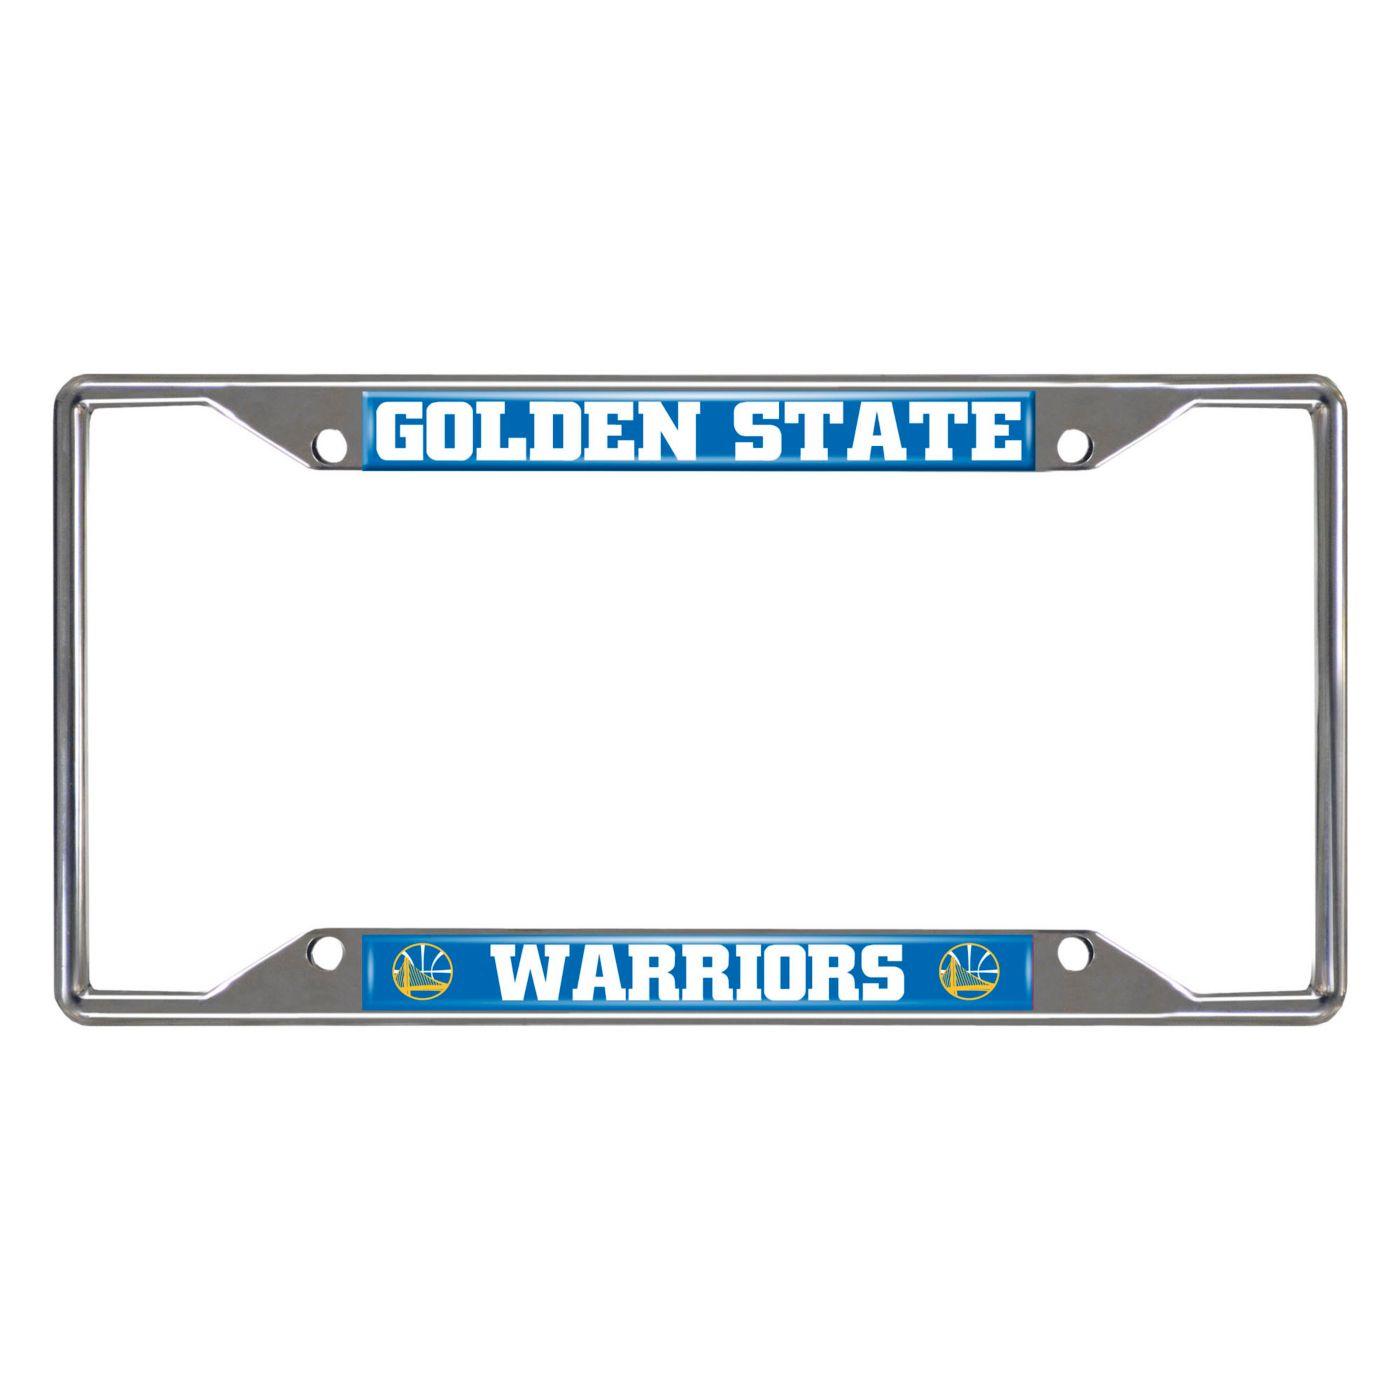 FANMATS Golden State Warriors License Plate Frame